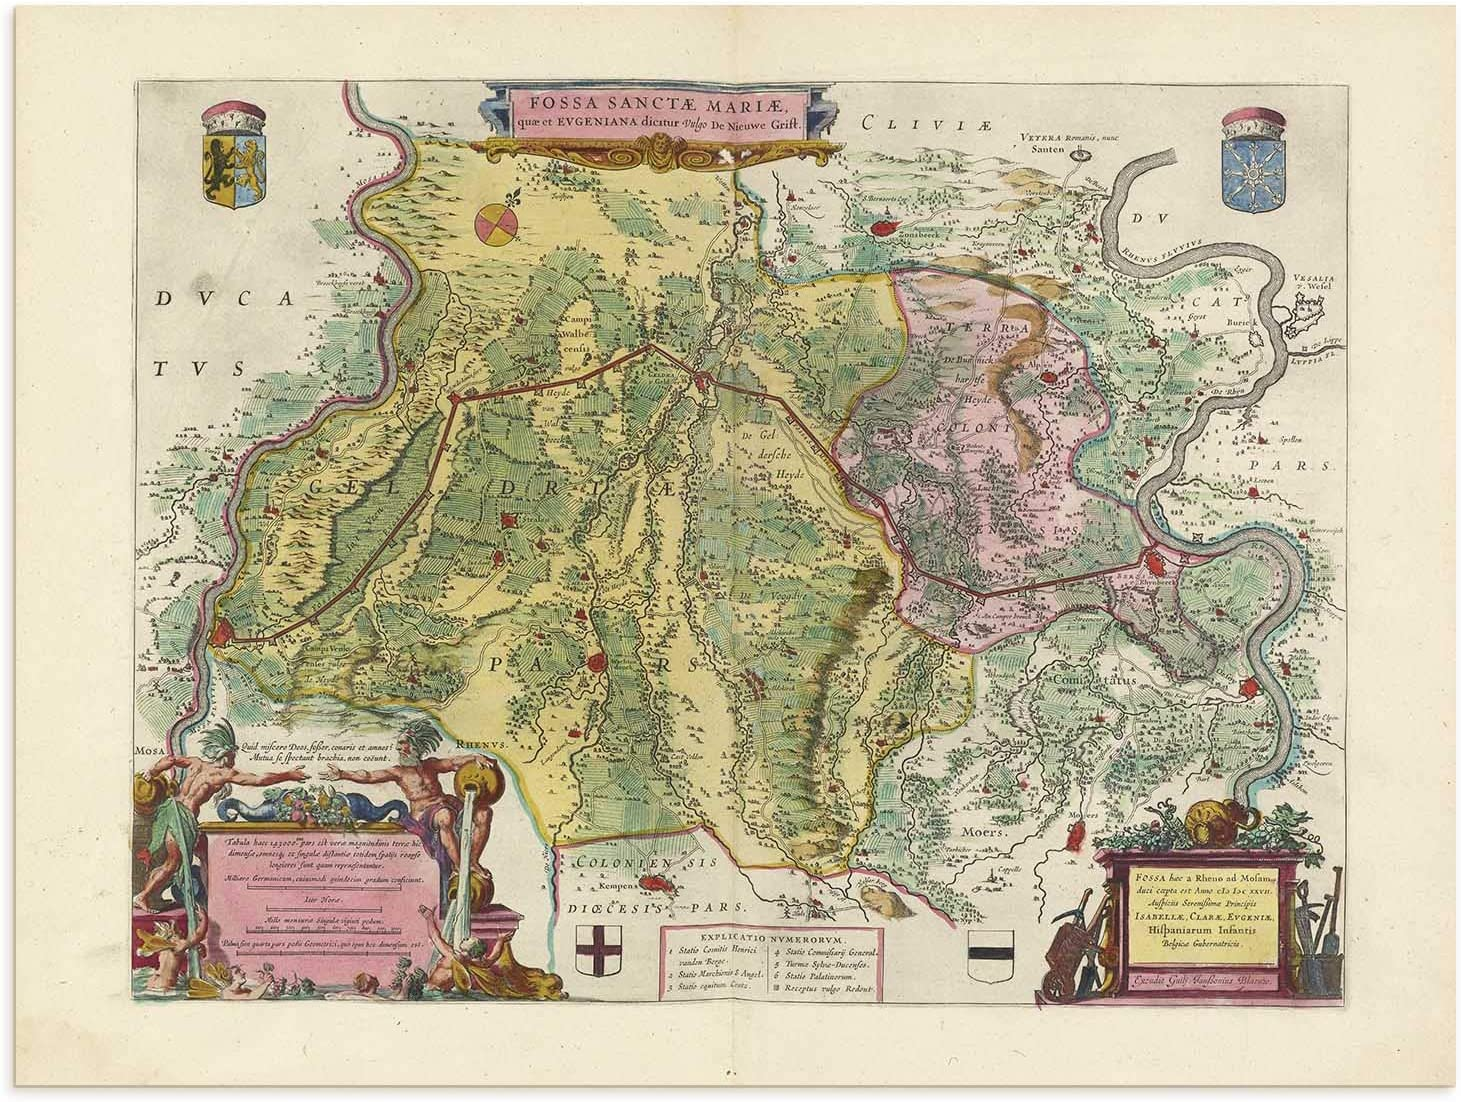 The Blaeu Prints   Wesel, Nordrhein-Westfalen - Historical Map Print from Antique Atlas by Joan Blaeu - Old Map Shows: Duisburg, Krefeld, Moers